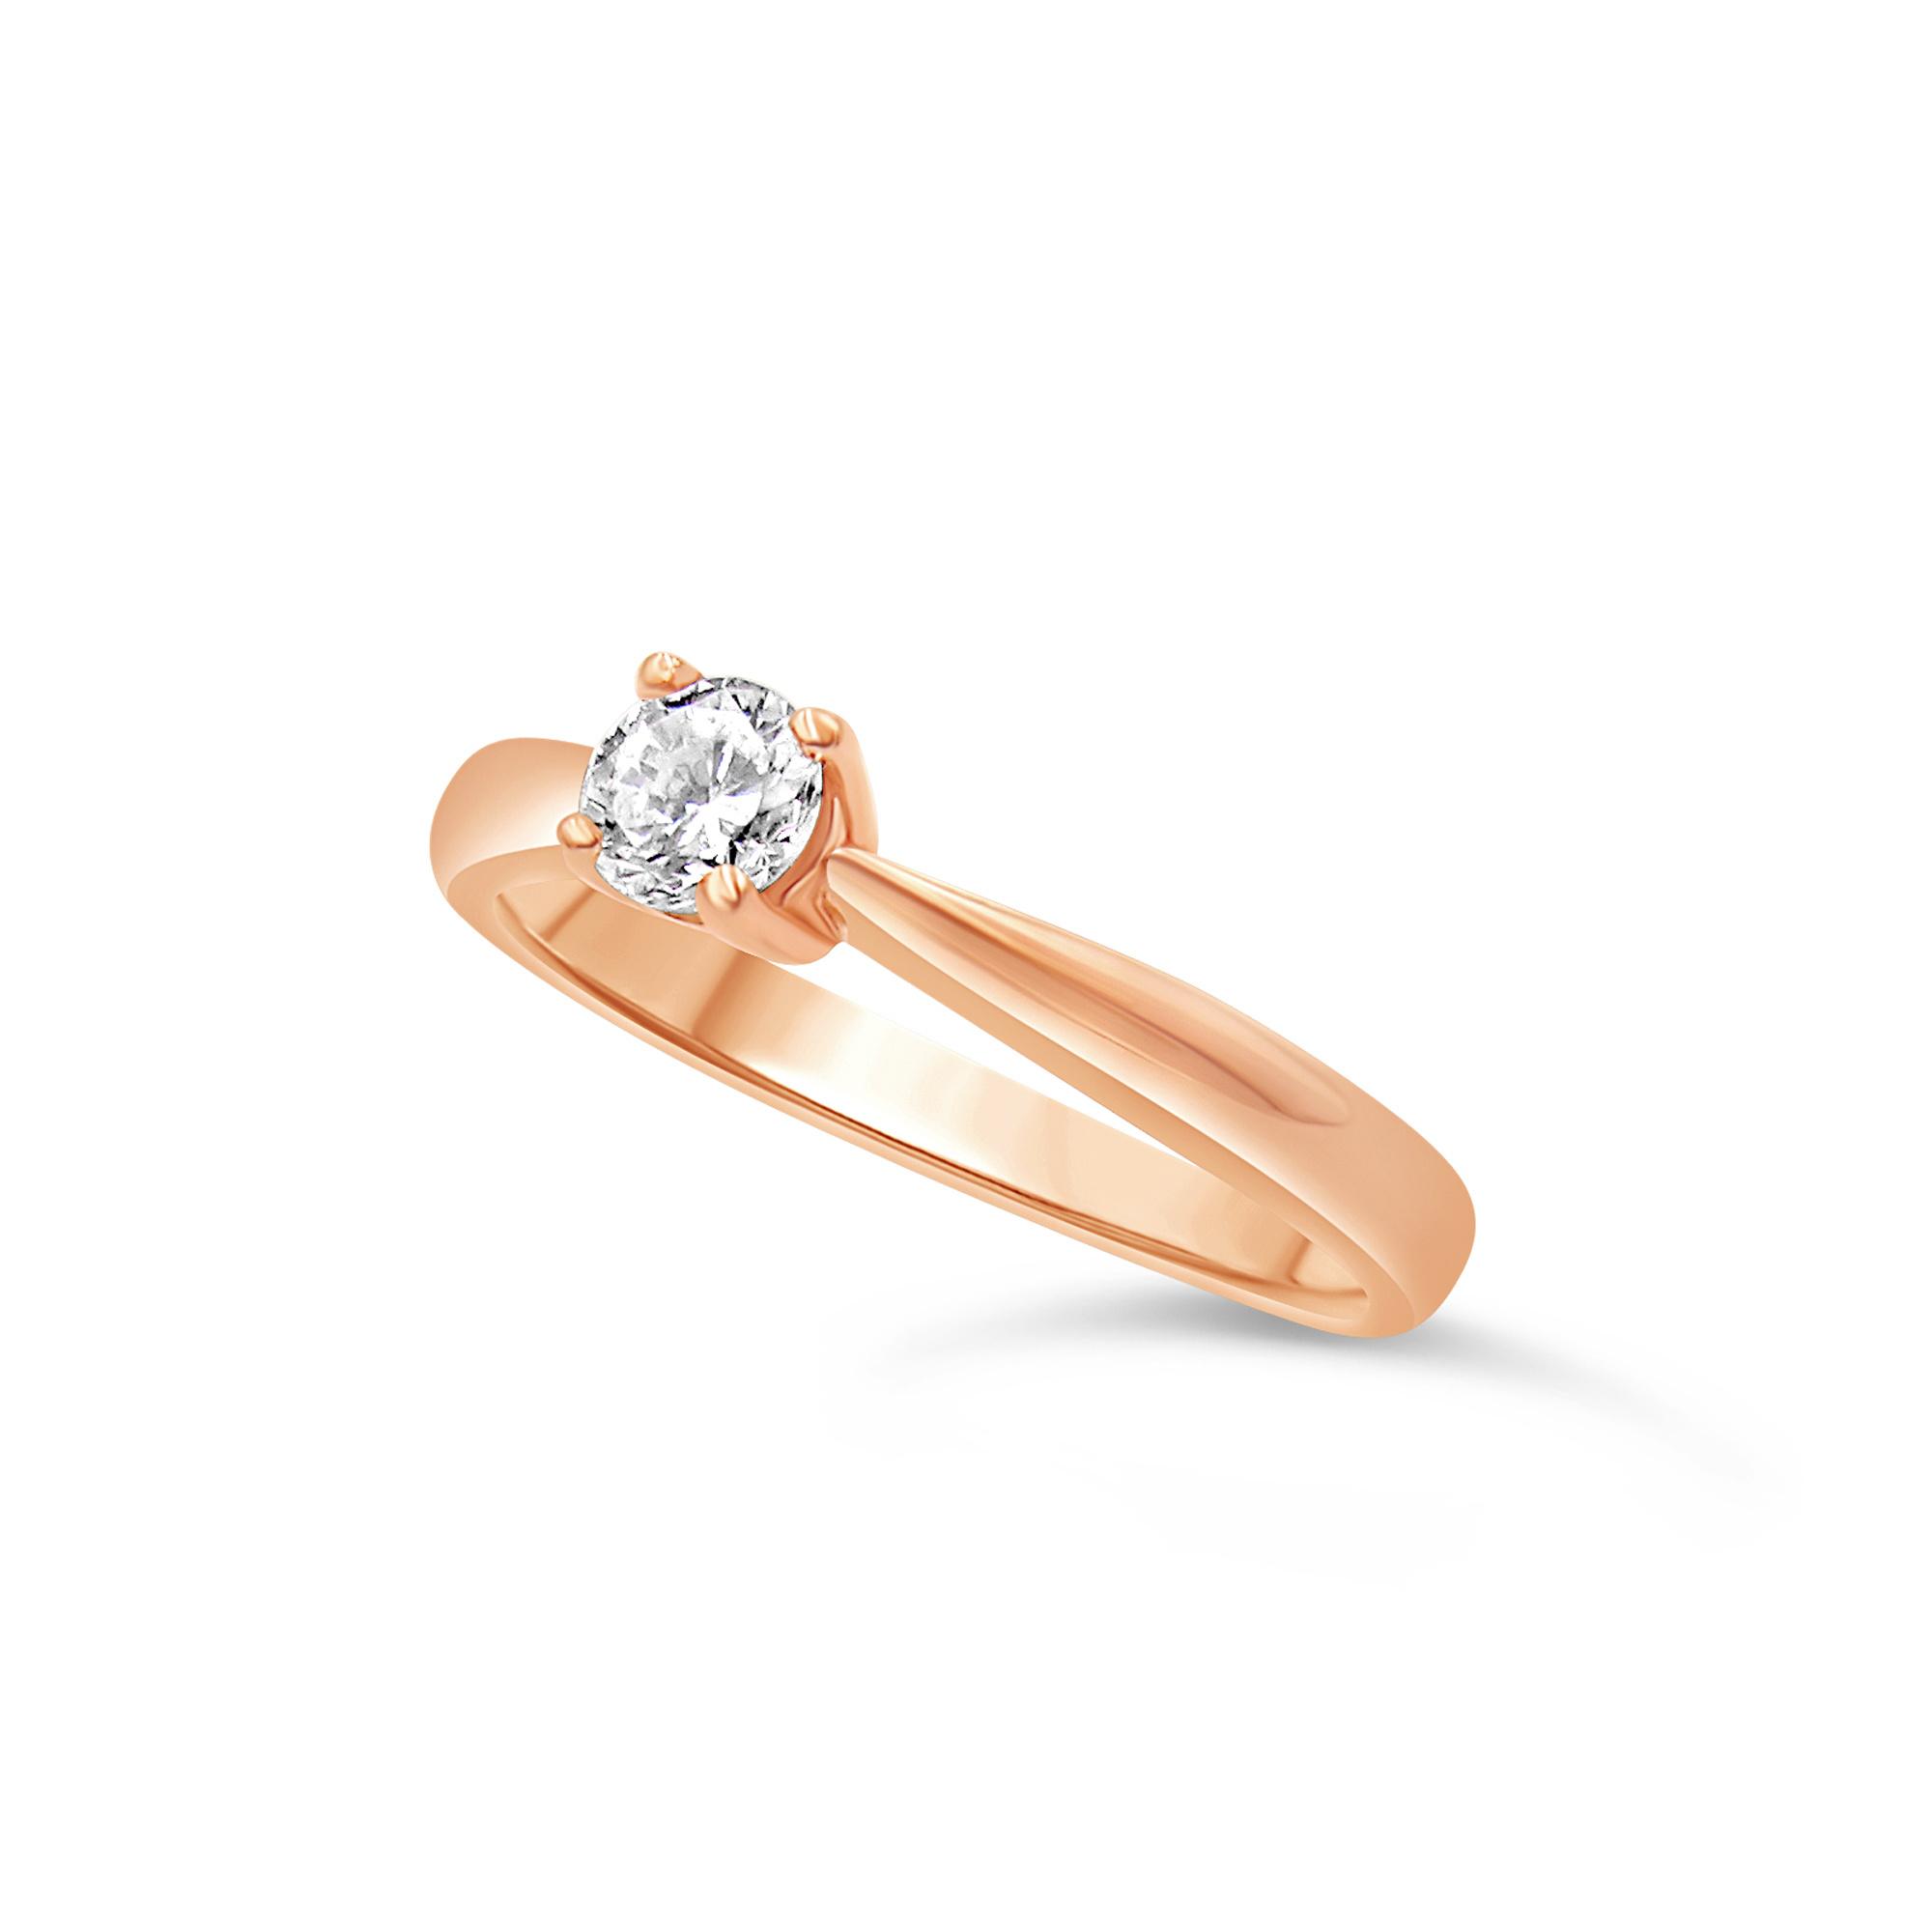 18kt roze goud verlovingsring met 0.31 ct diamant